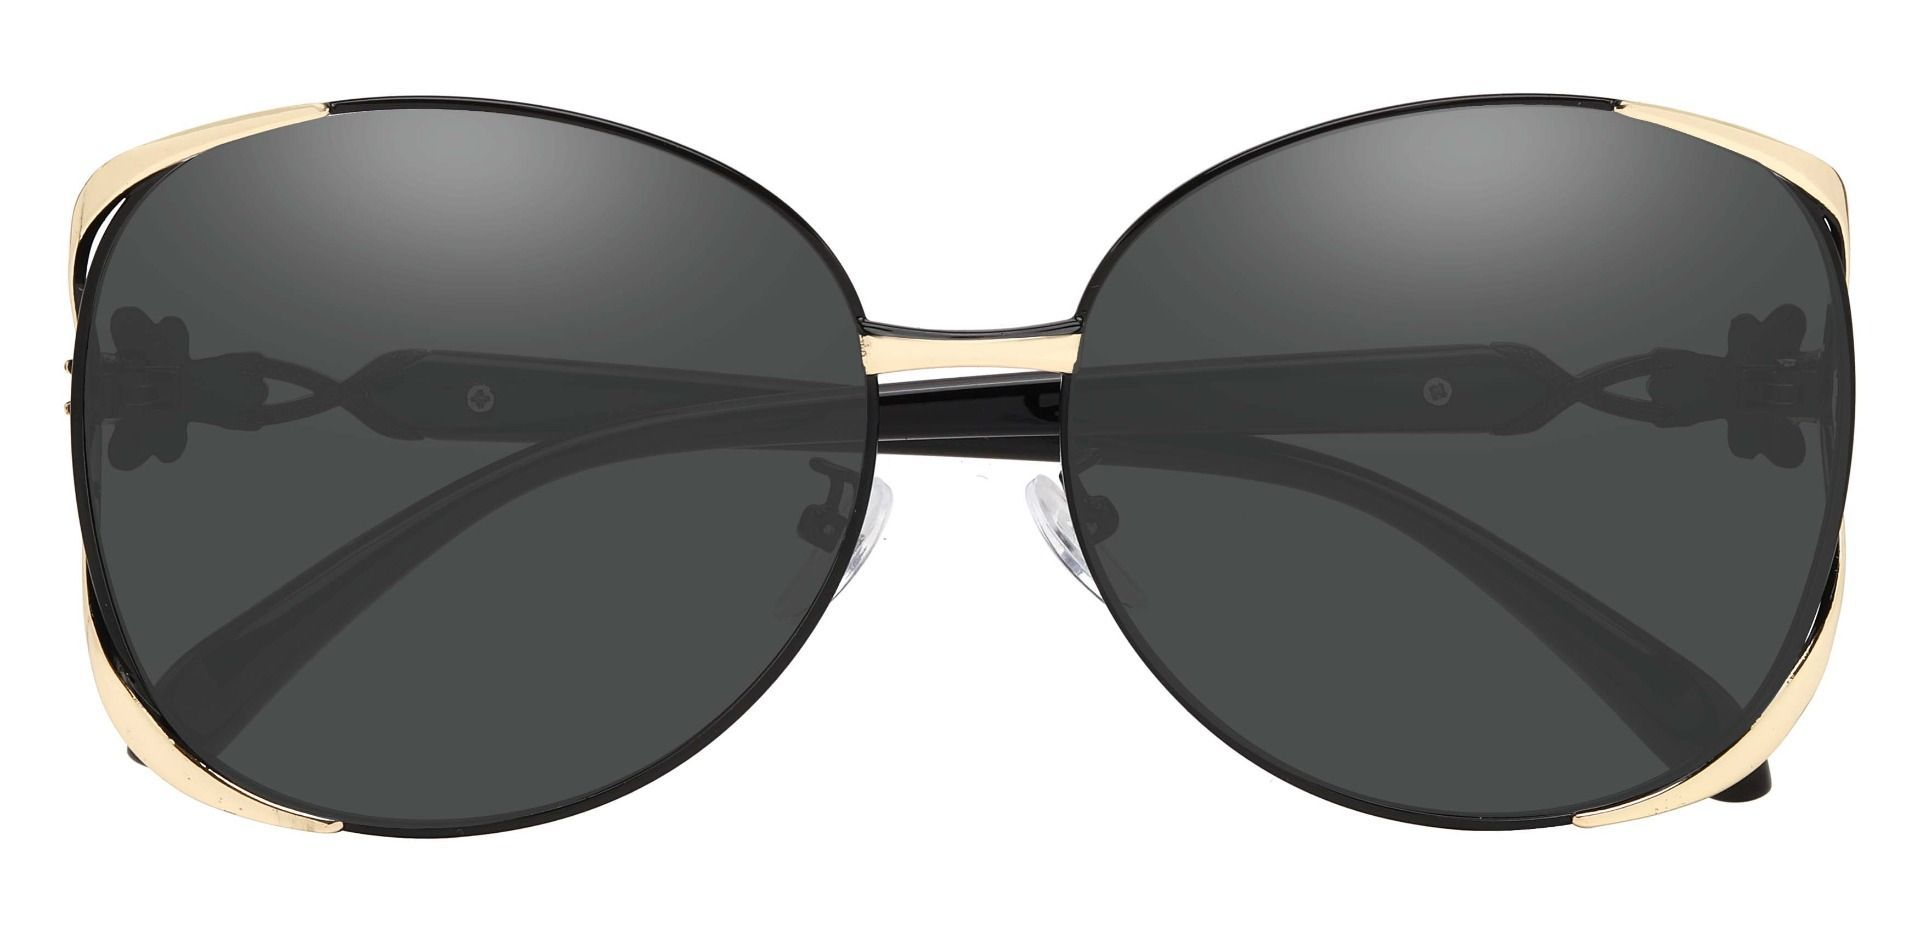 Nina Round Single Vision Sunglasses - Black Frame With Gray Lenses